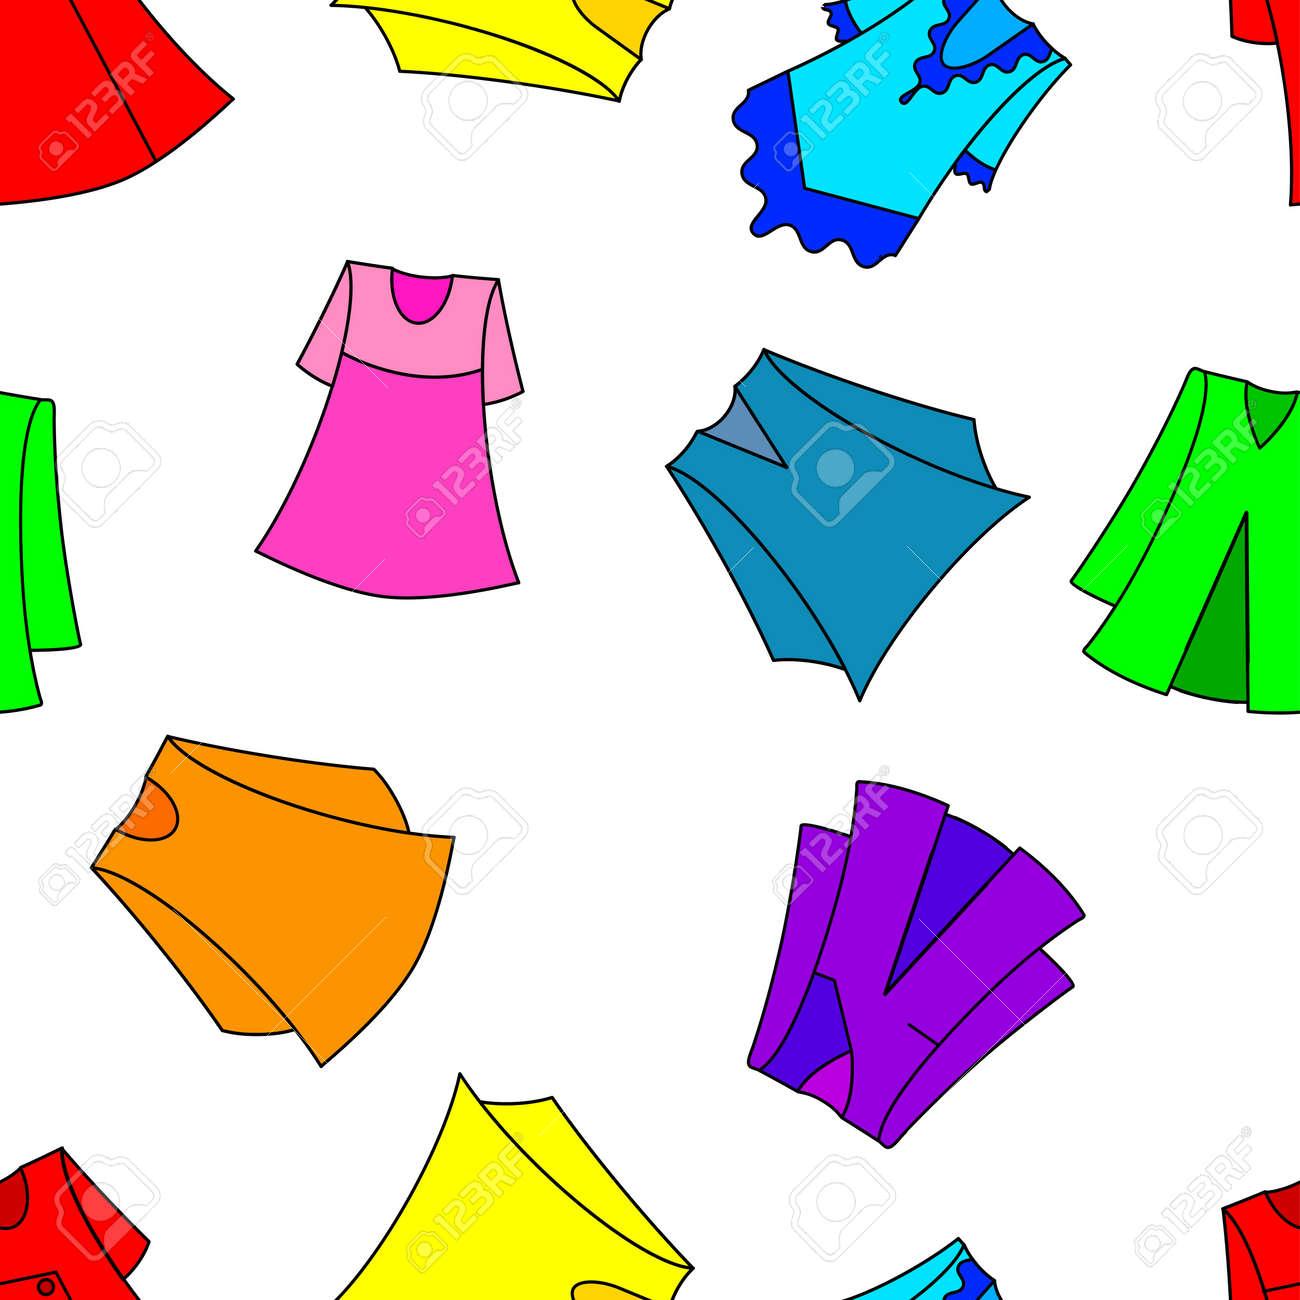 Vestidos De Moda Para Fondo De Pantalla Chica Sin Fisuras Ilustración Vectorial